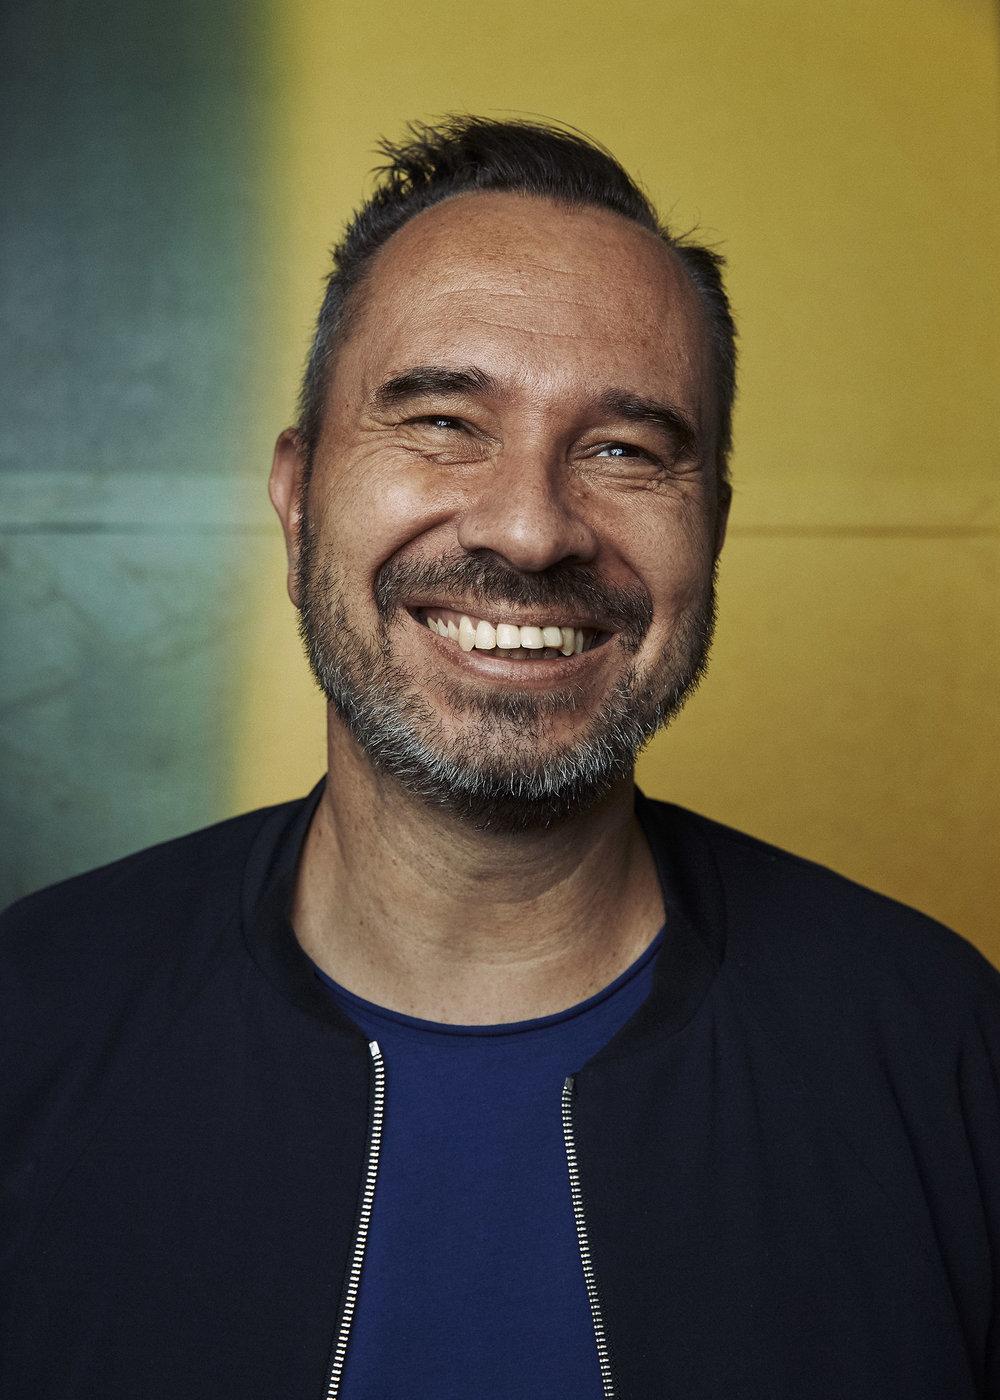 Alain Gilles, designer